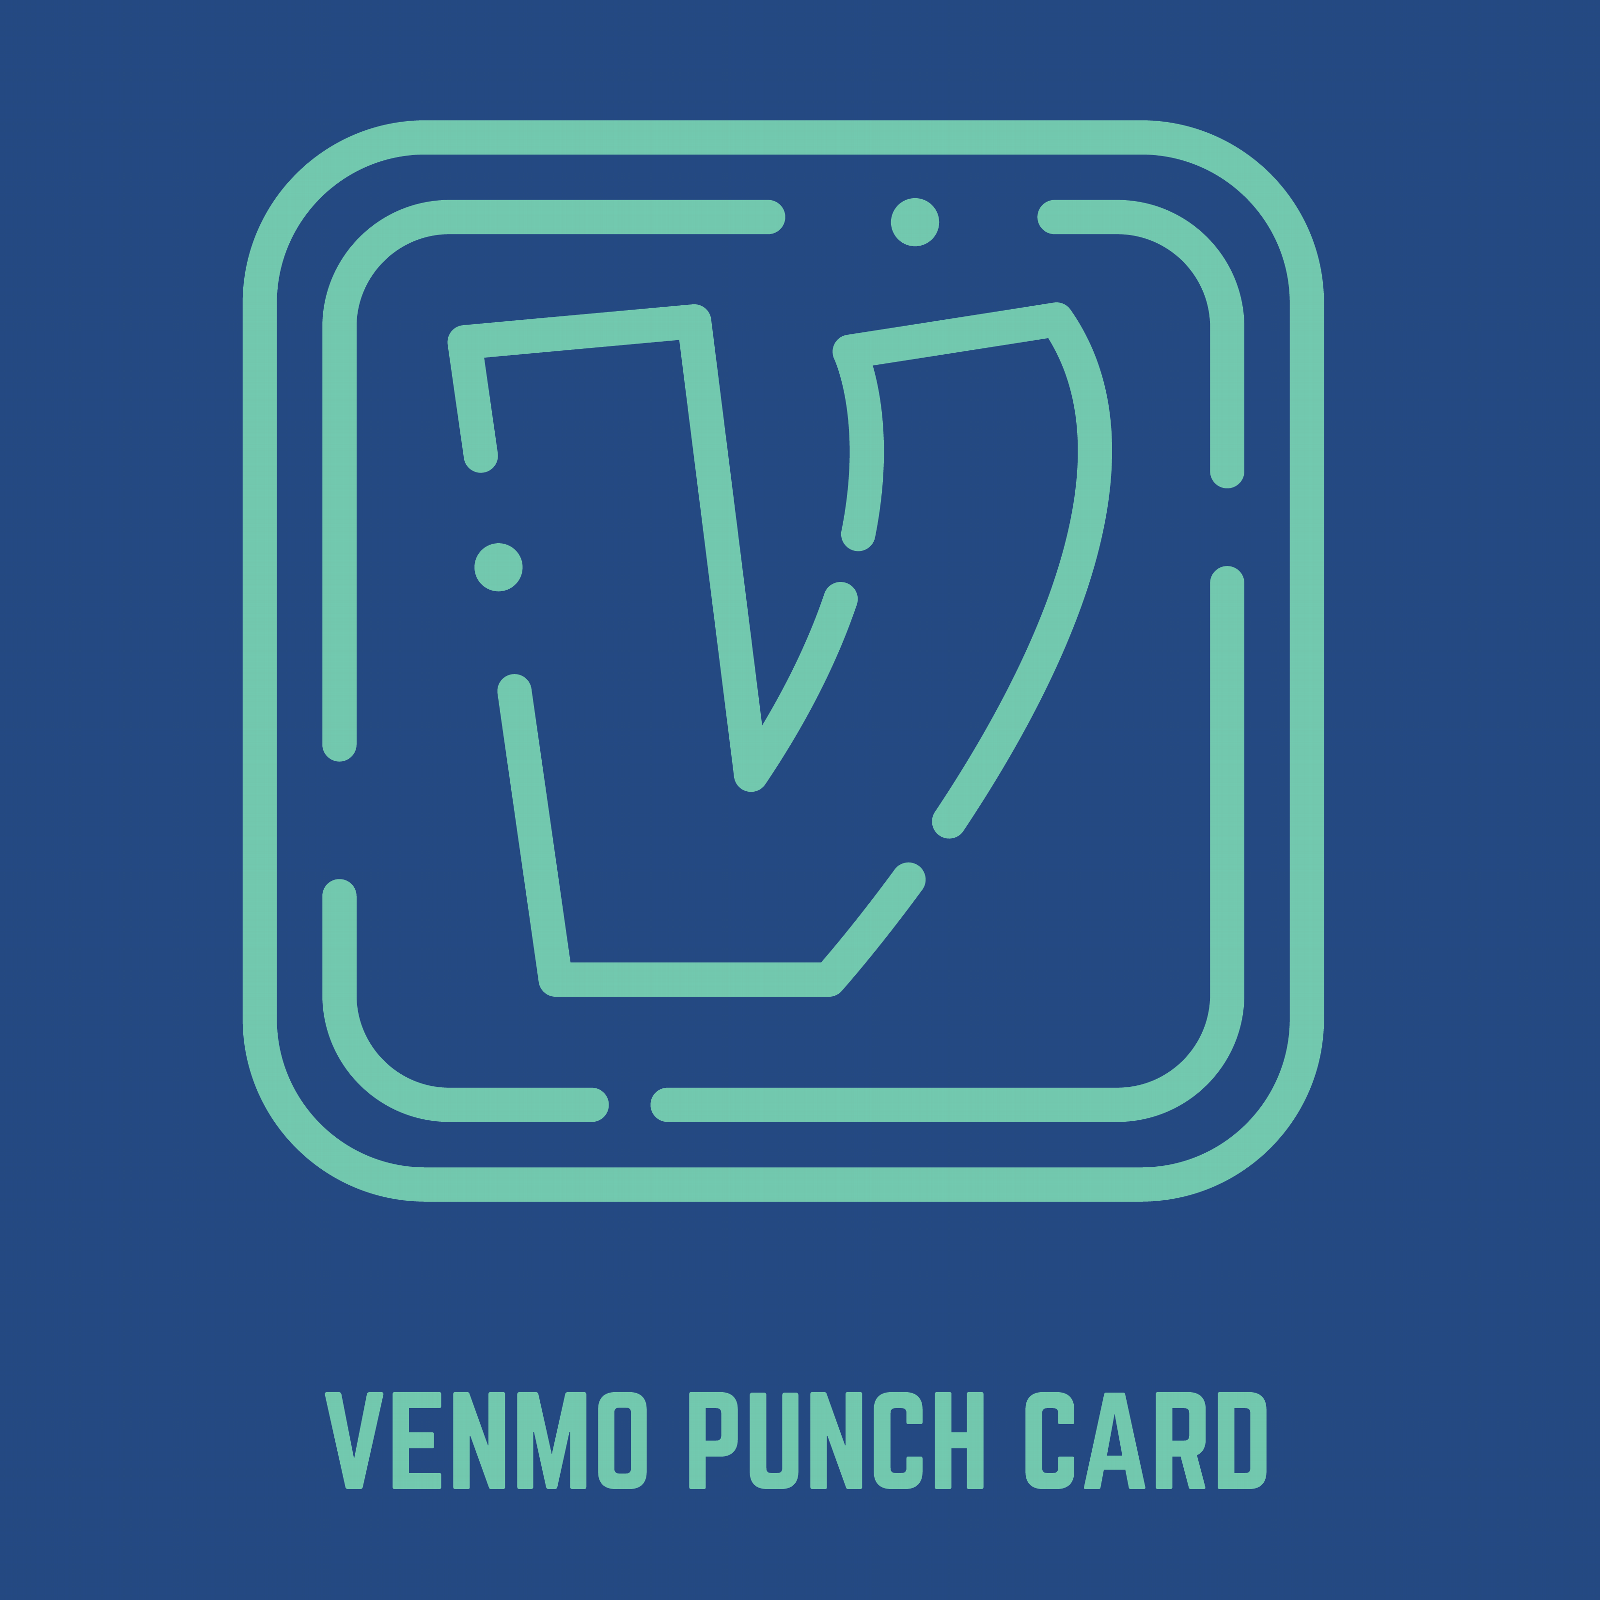 Venmo Punch Card